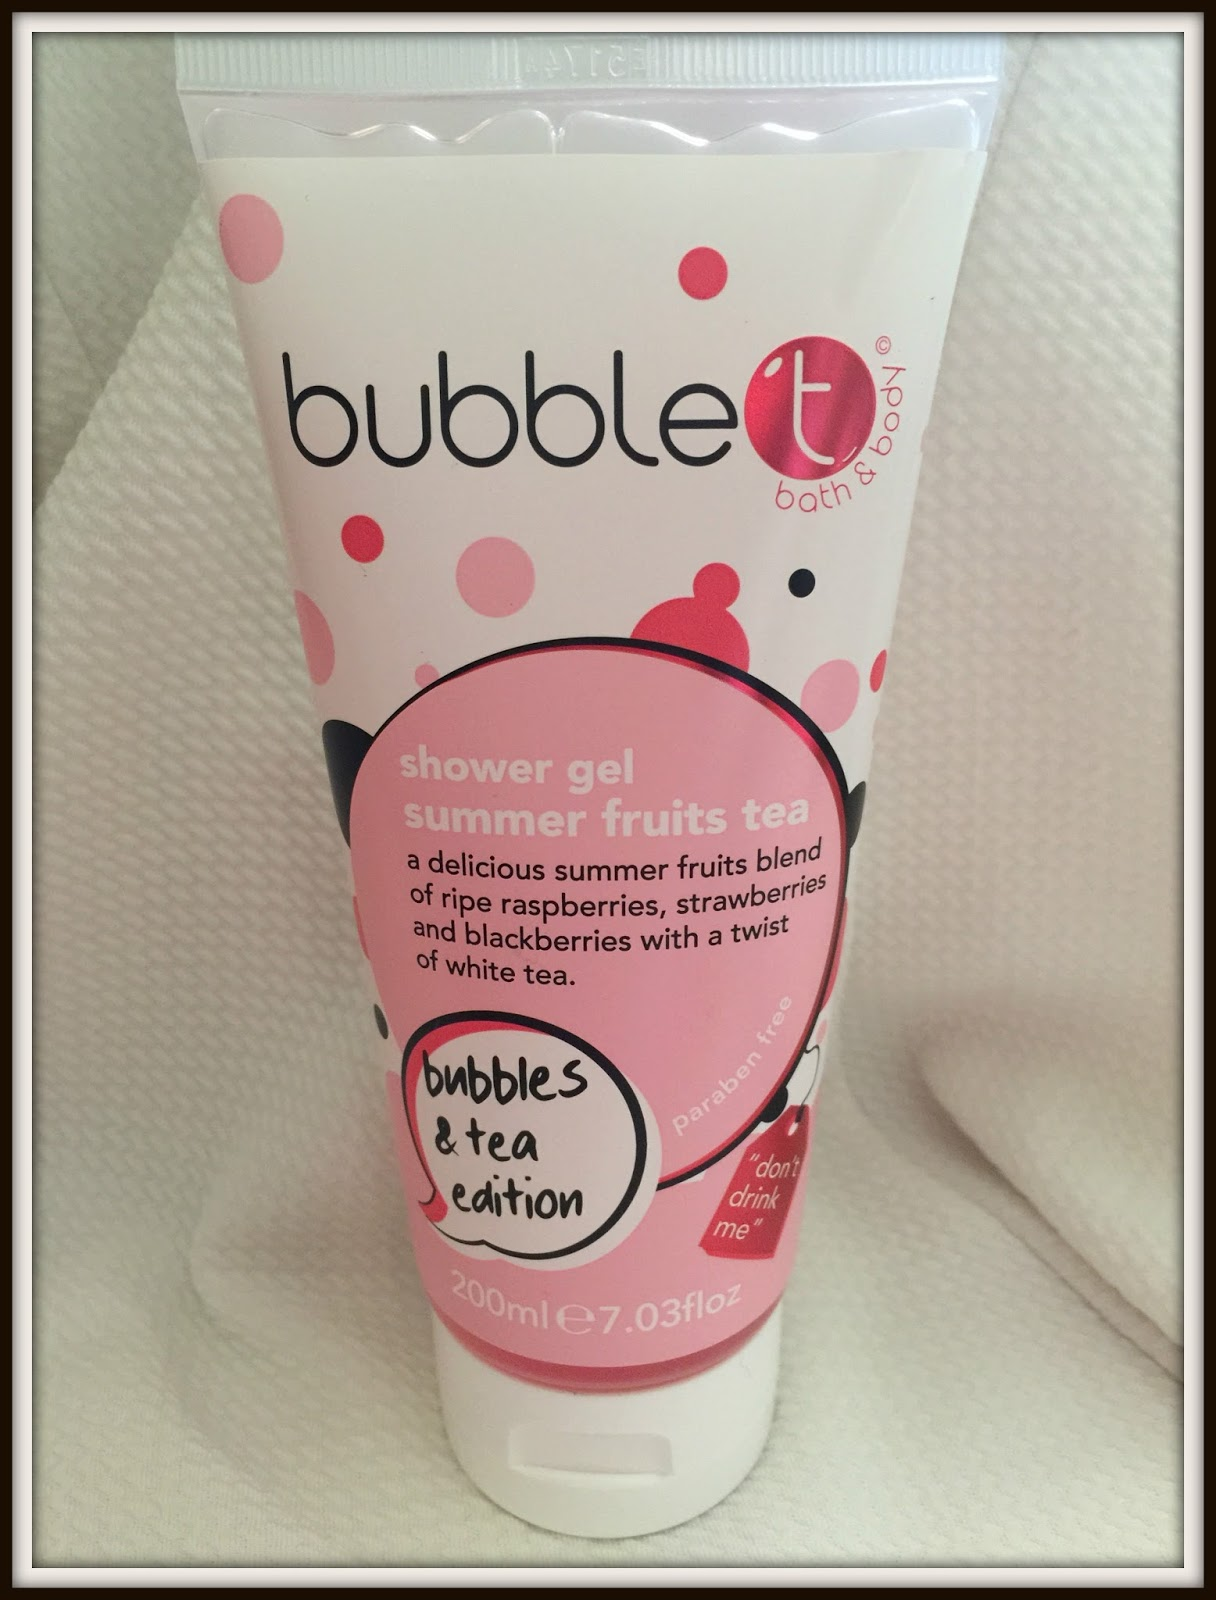 100 shower gel for bubble bath philosophy vanilla birthday shower gel for bubble bath superdrug launch bubble t a fabulous new range of bath and body